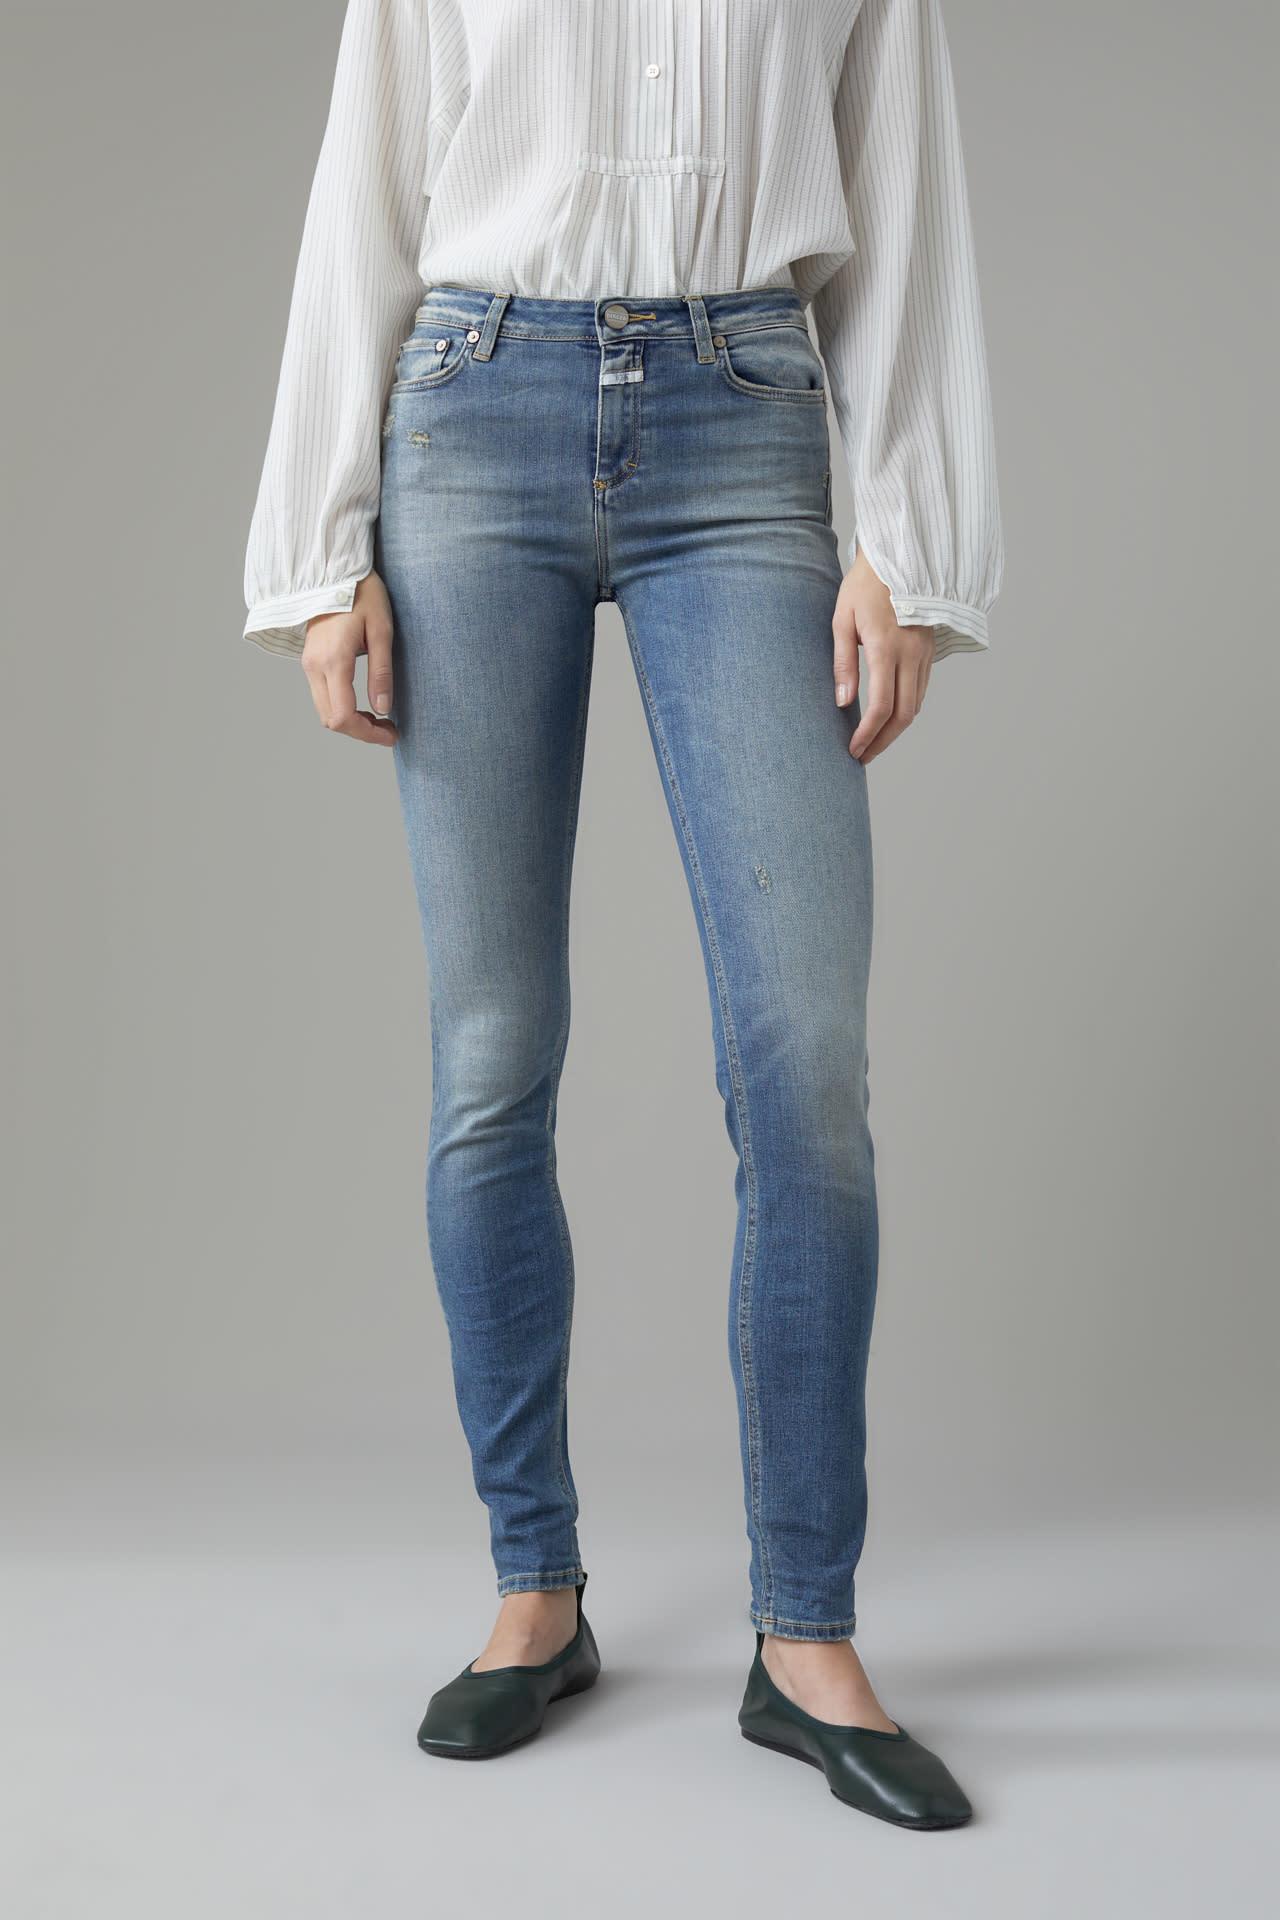 Lizzy Jeans - Organic Blue-1